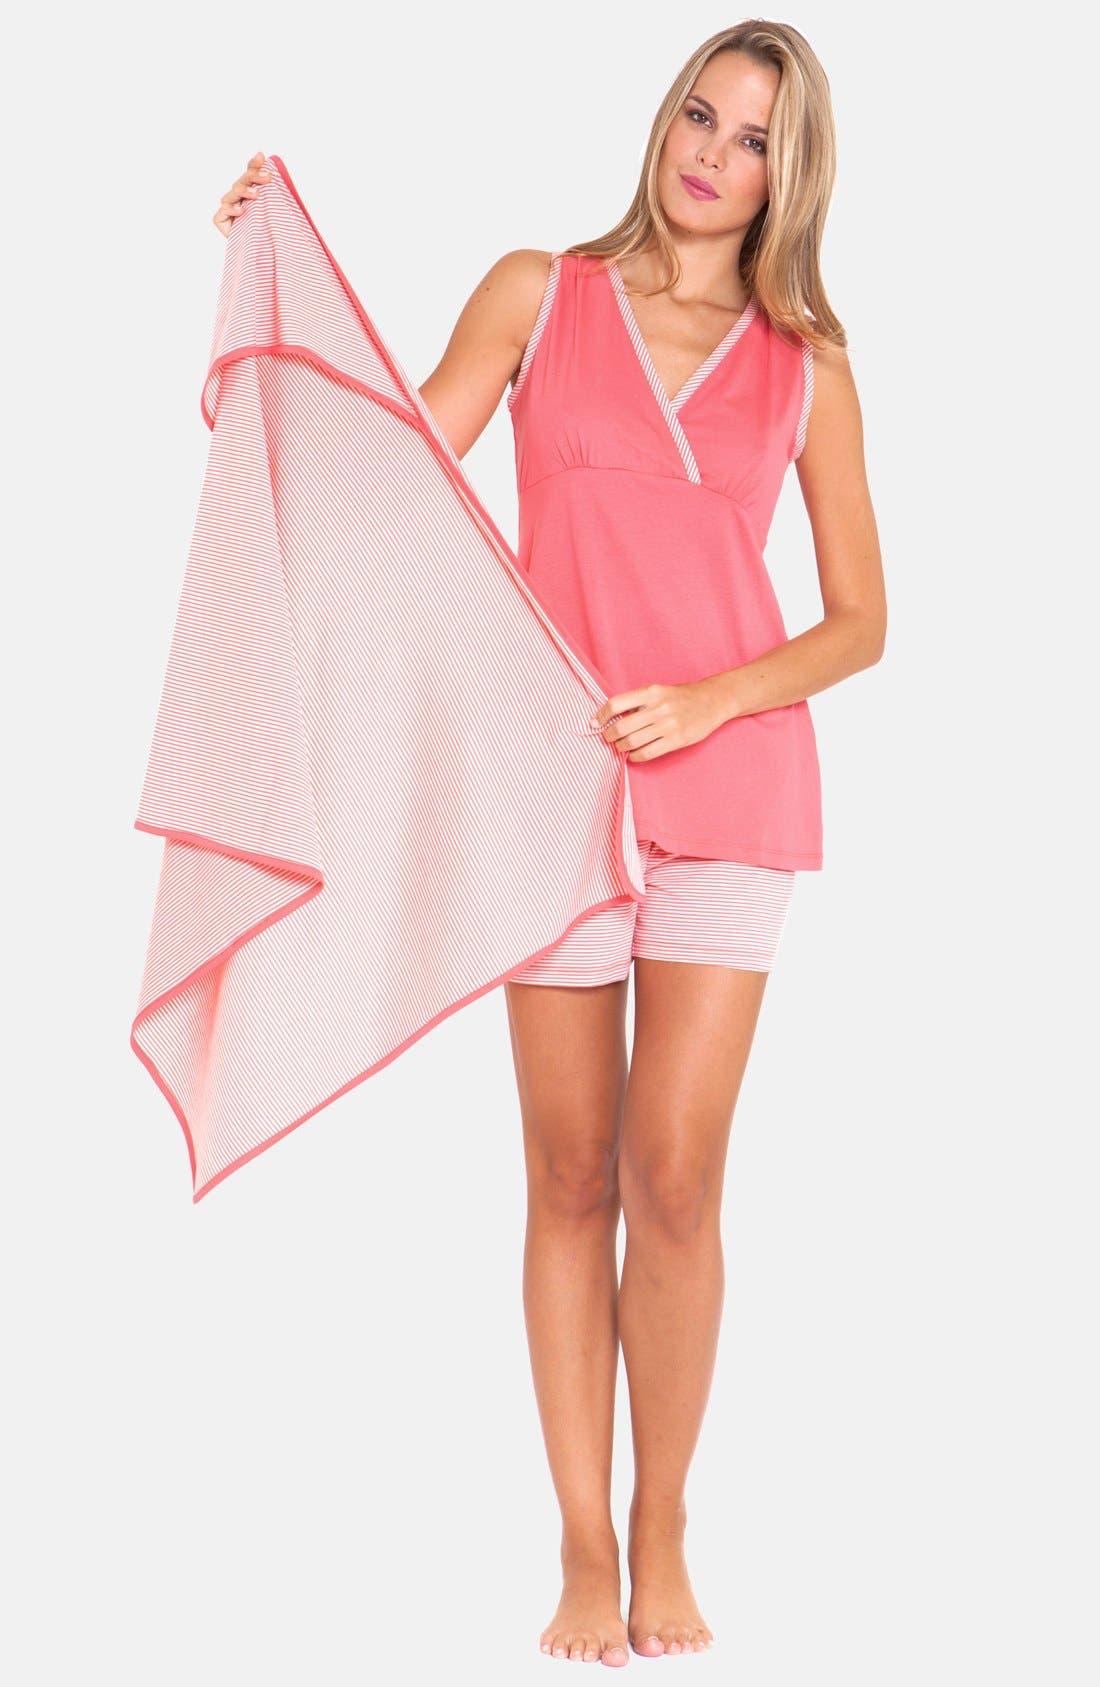 Main Image - Olian 3-Piece Maternity Sleepwear Gift Set